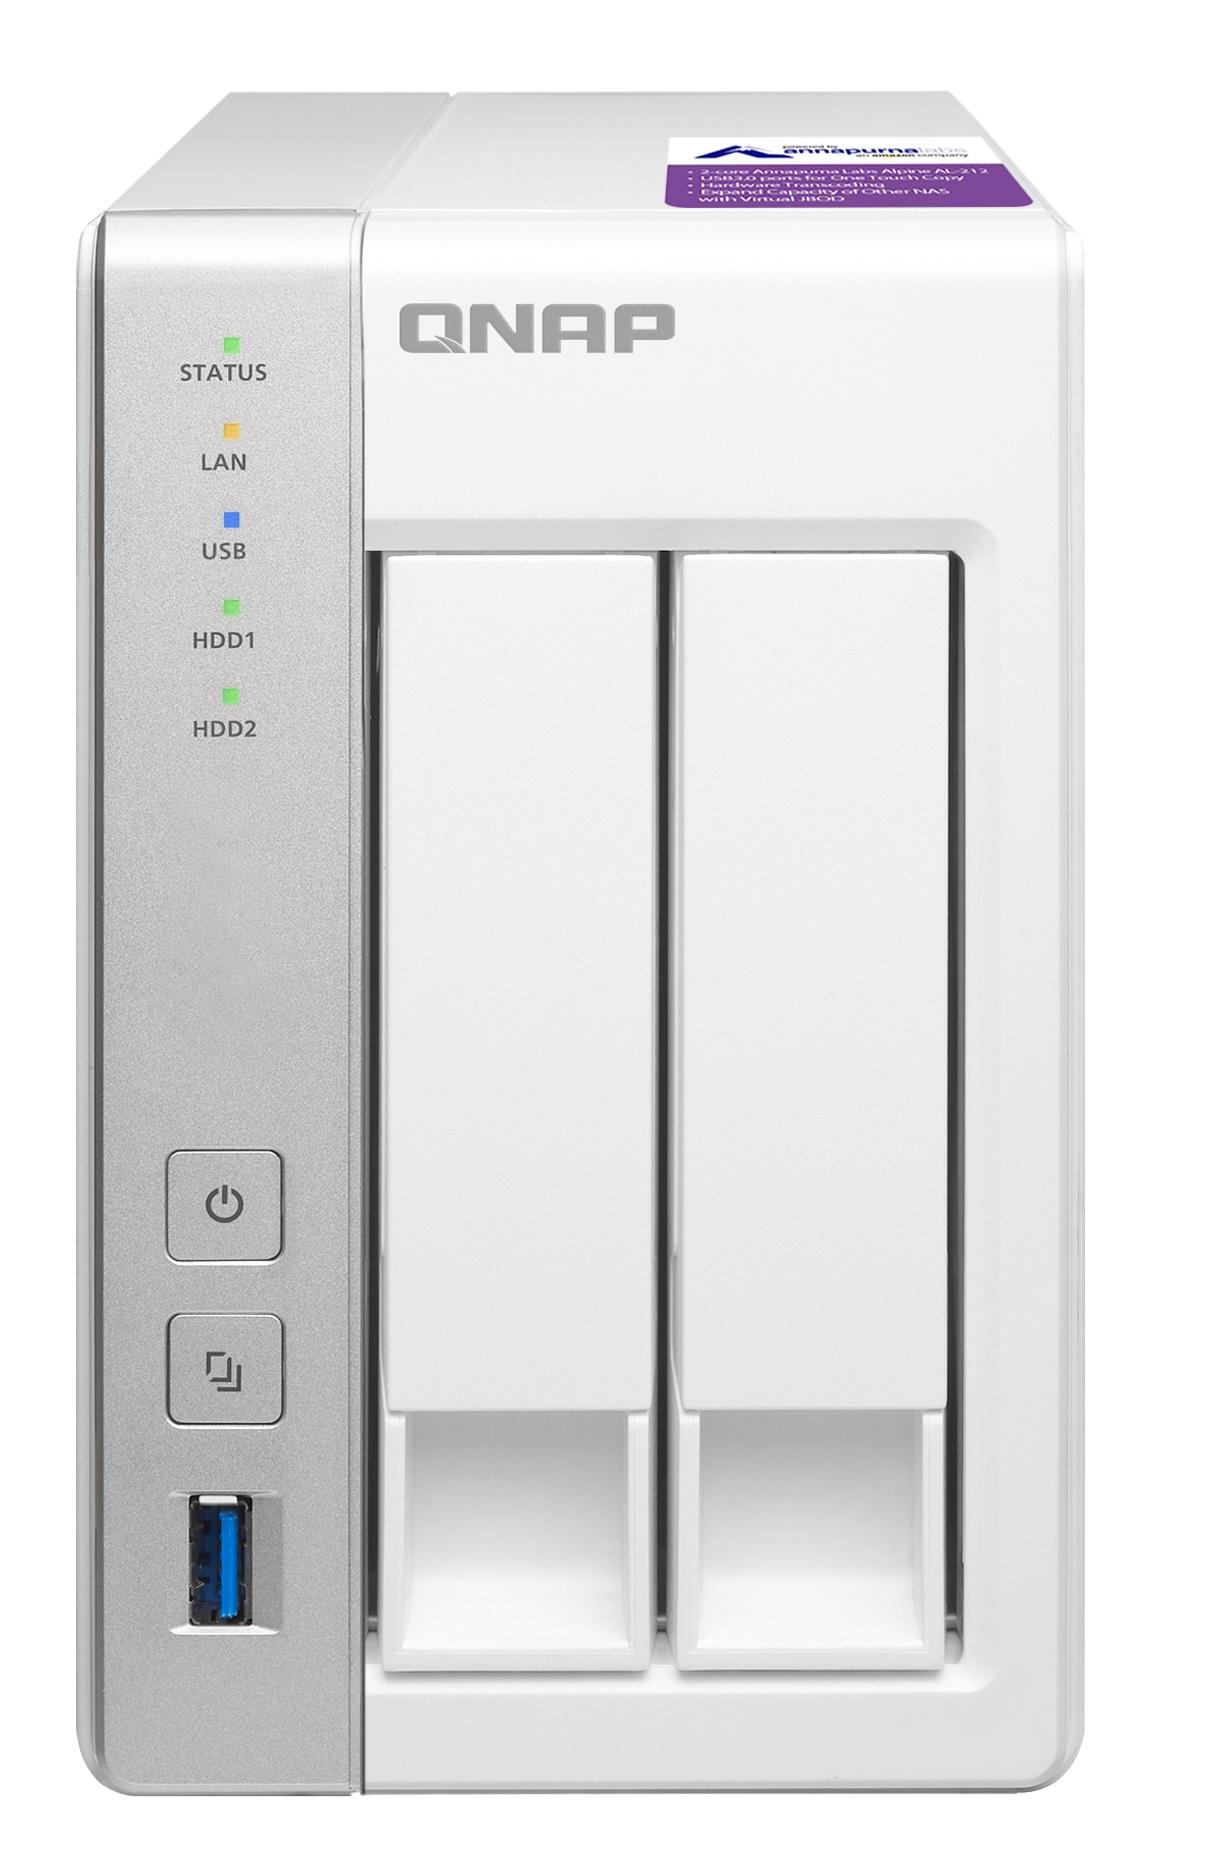 QNAP TS-231P (1,7GHz/1GB RAM/2xSATA)